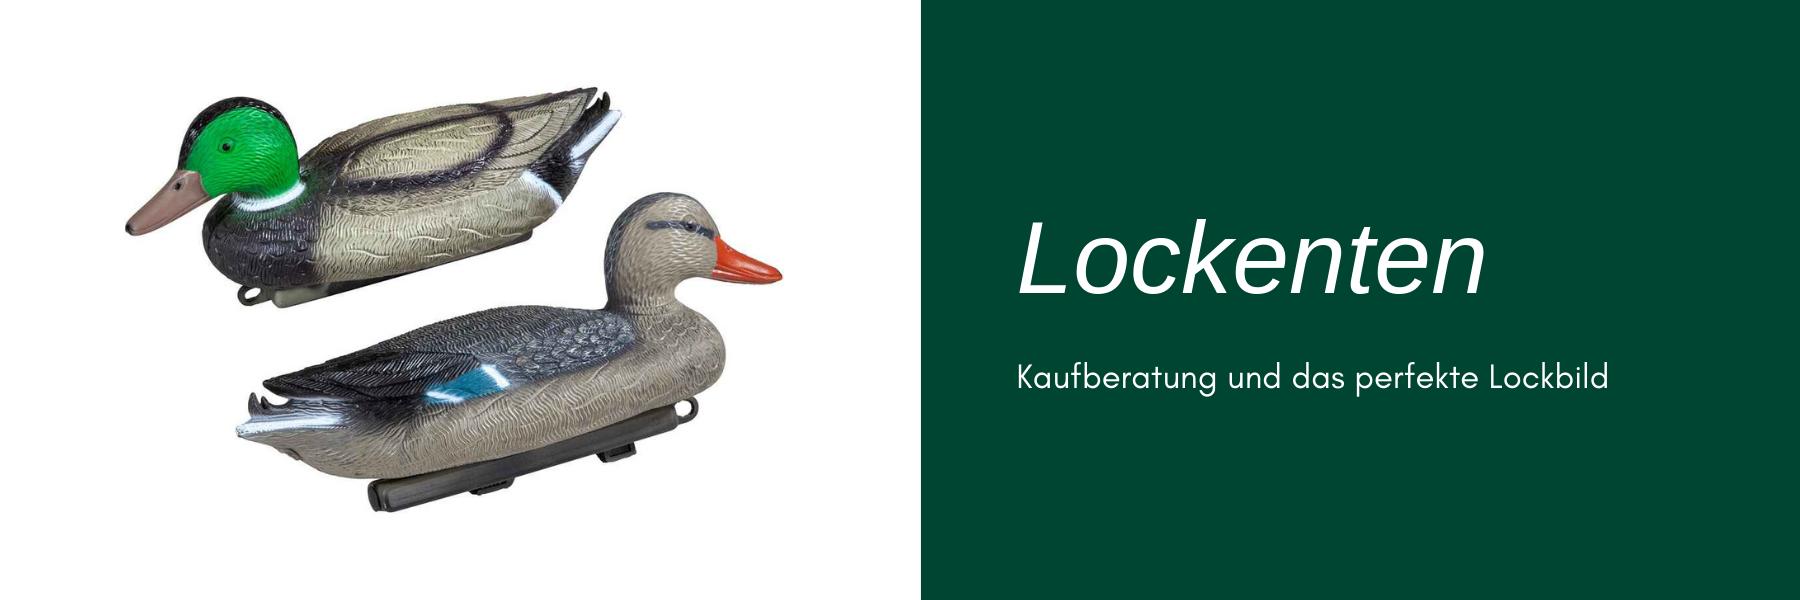 Lockenten - Kaufberatung & das perfekte Lockbild